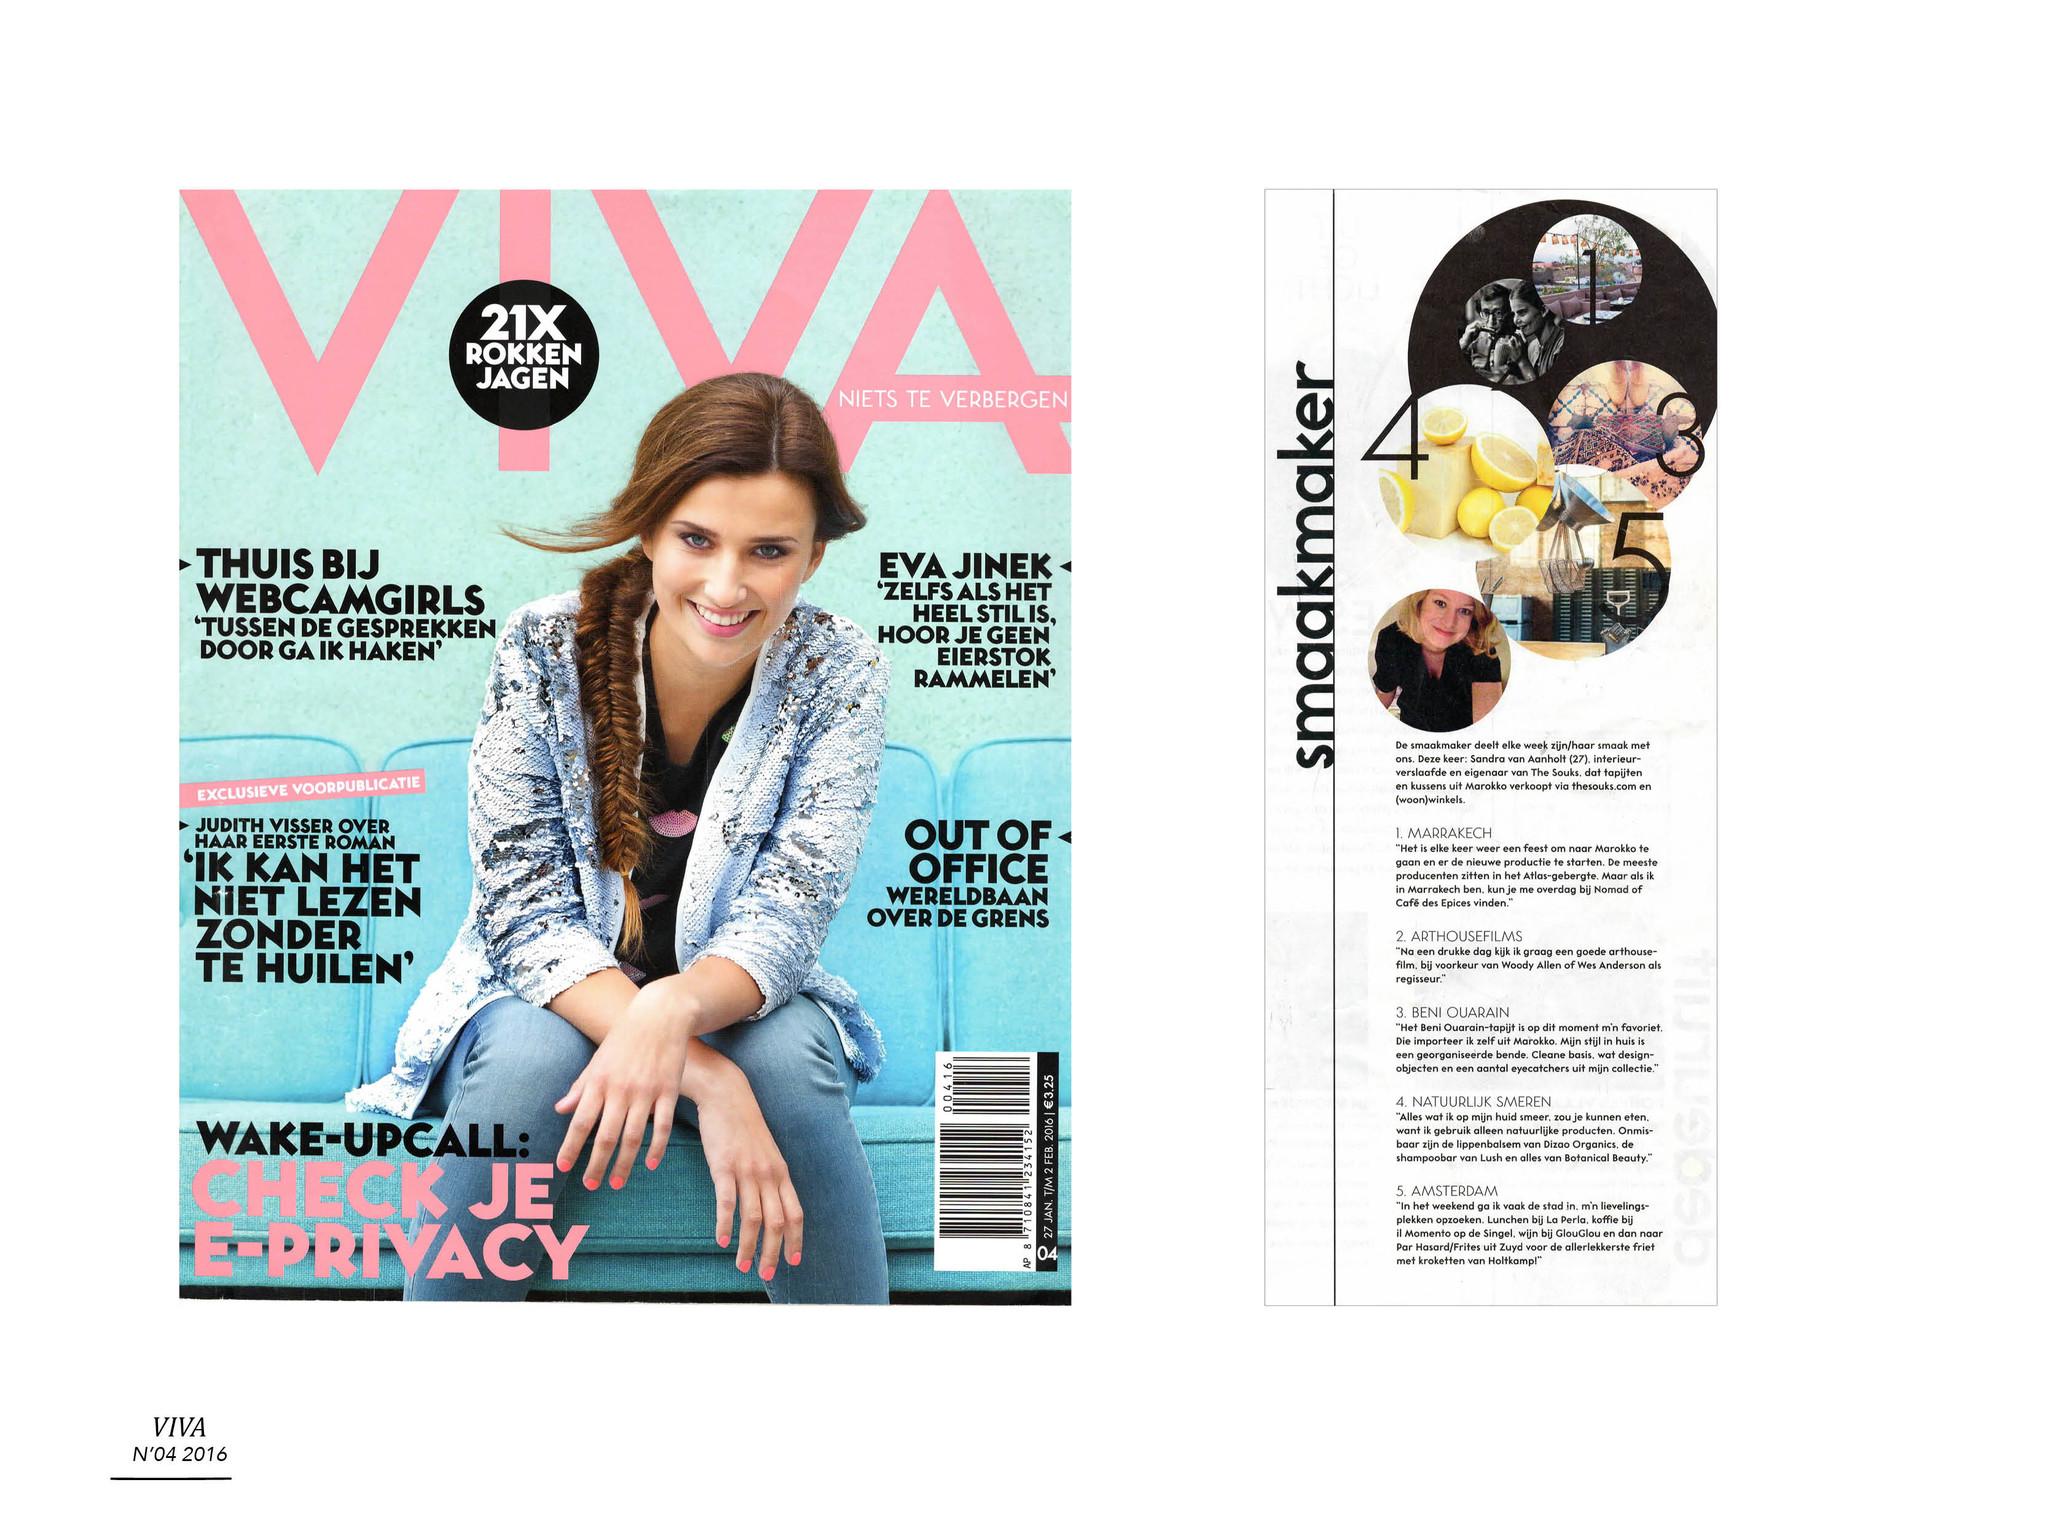 The Souks - publicatie Viva 2